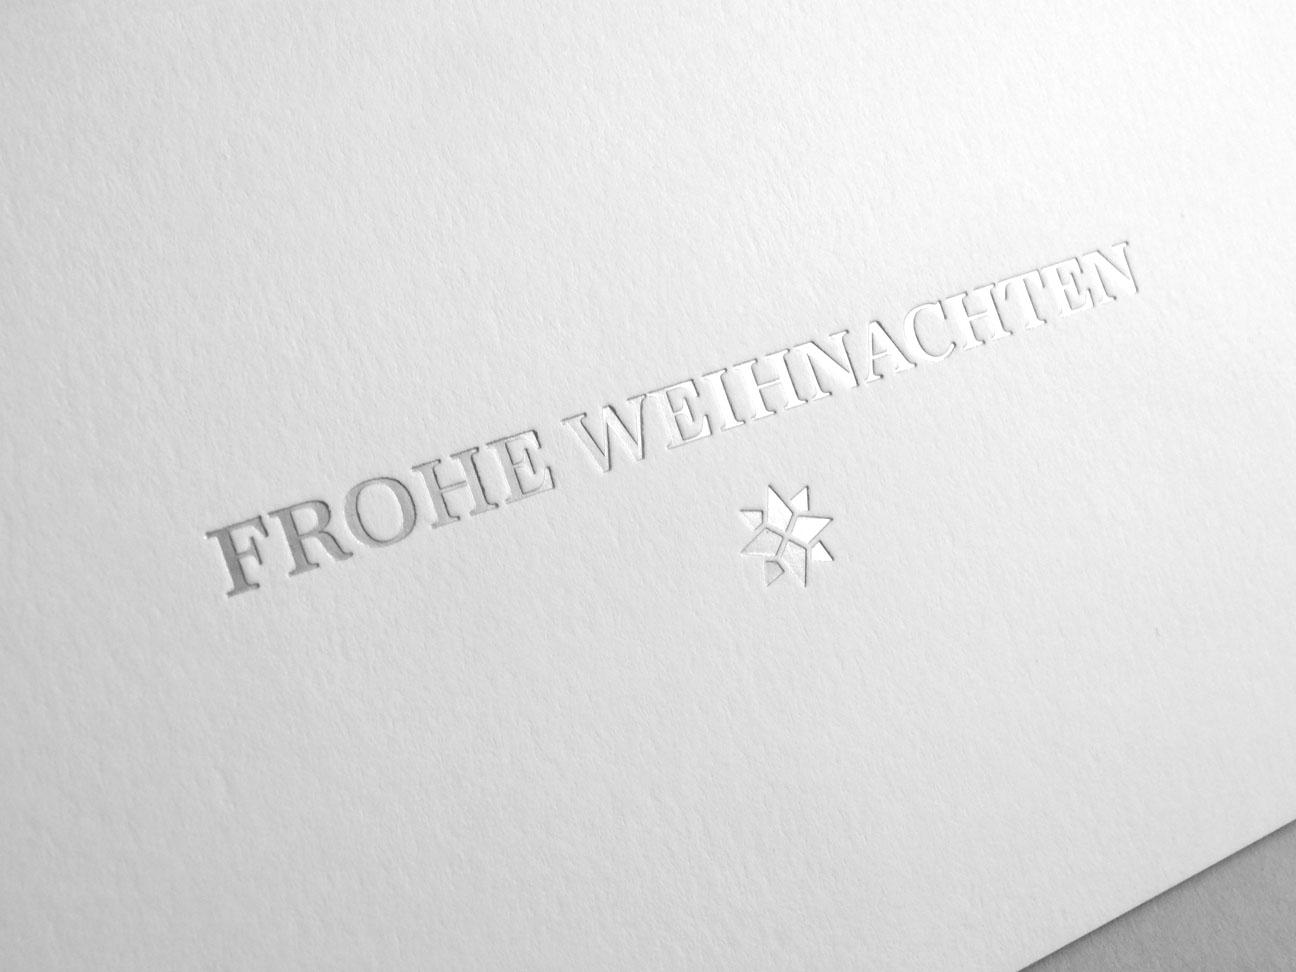 Weihnachtskarte mit Prägung matt silber edel VPF